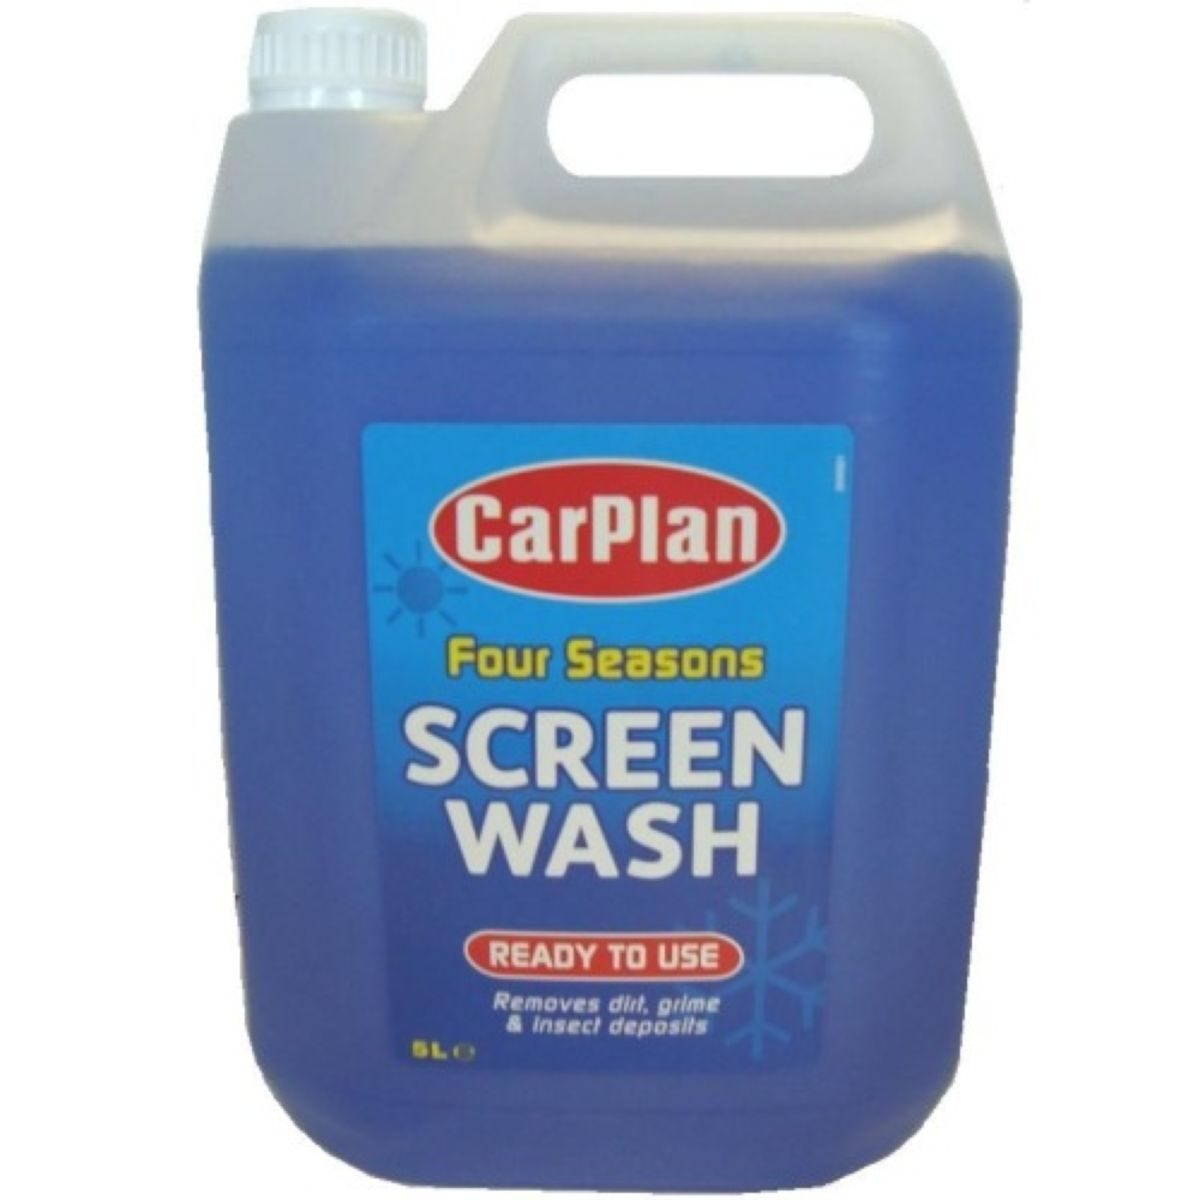 CarPlan Four Seasons Screenwash - 5L